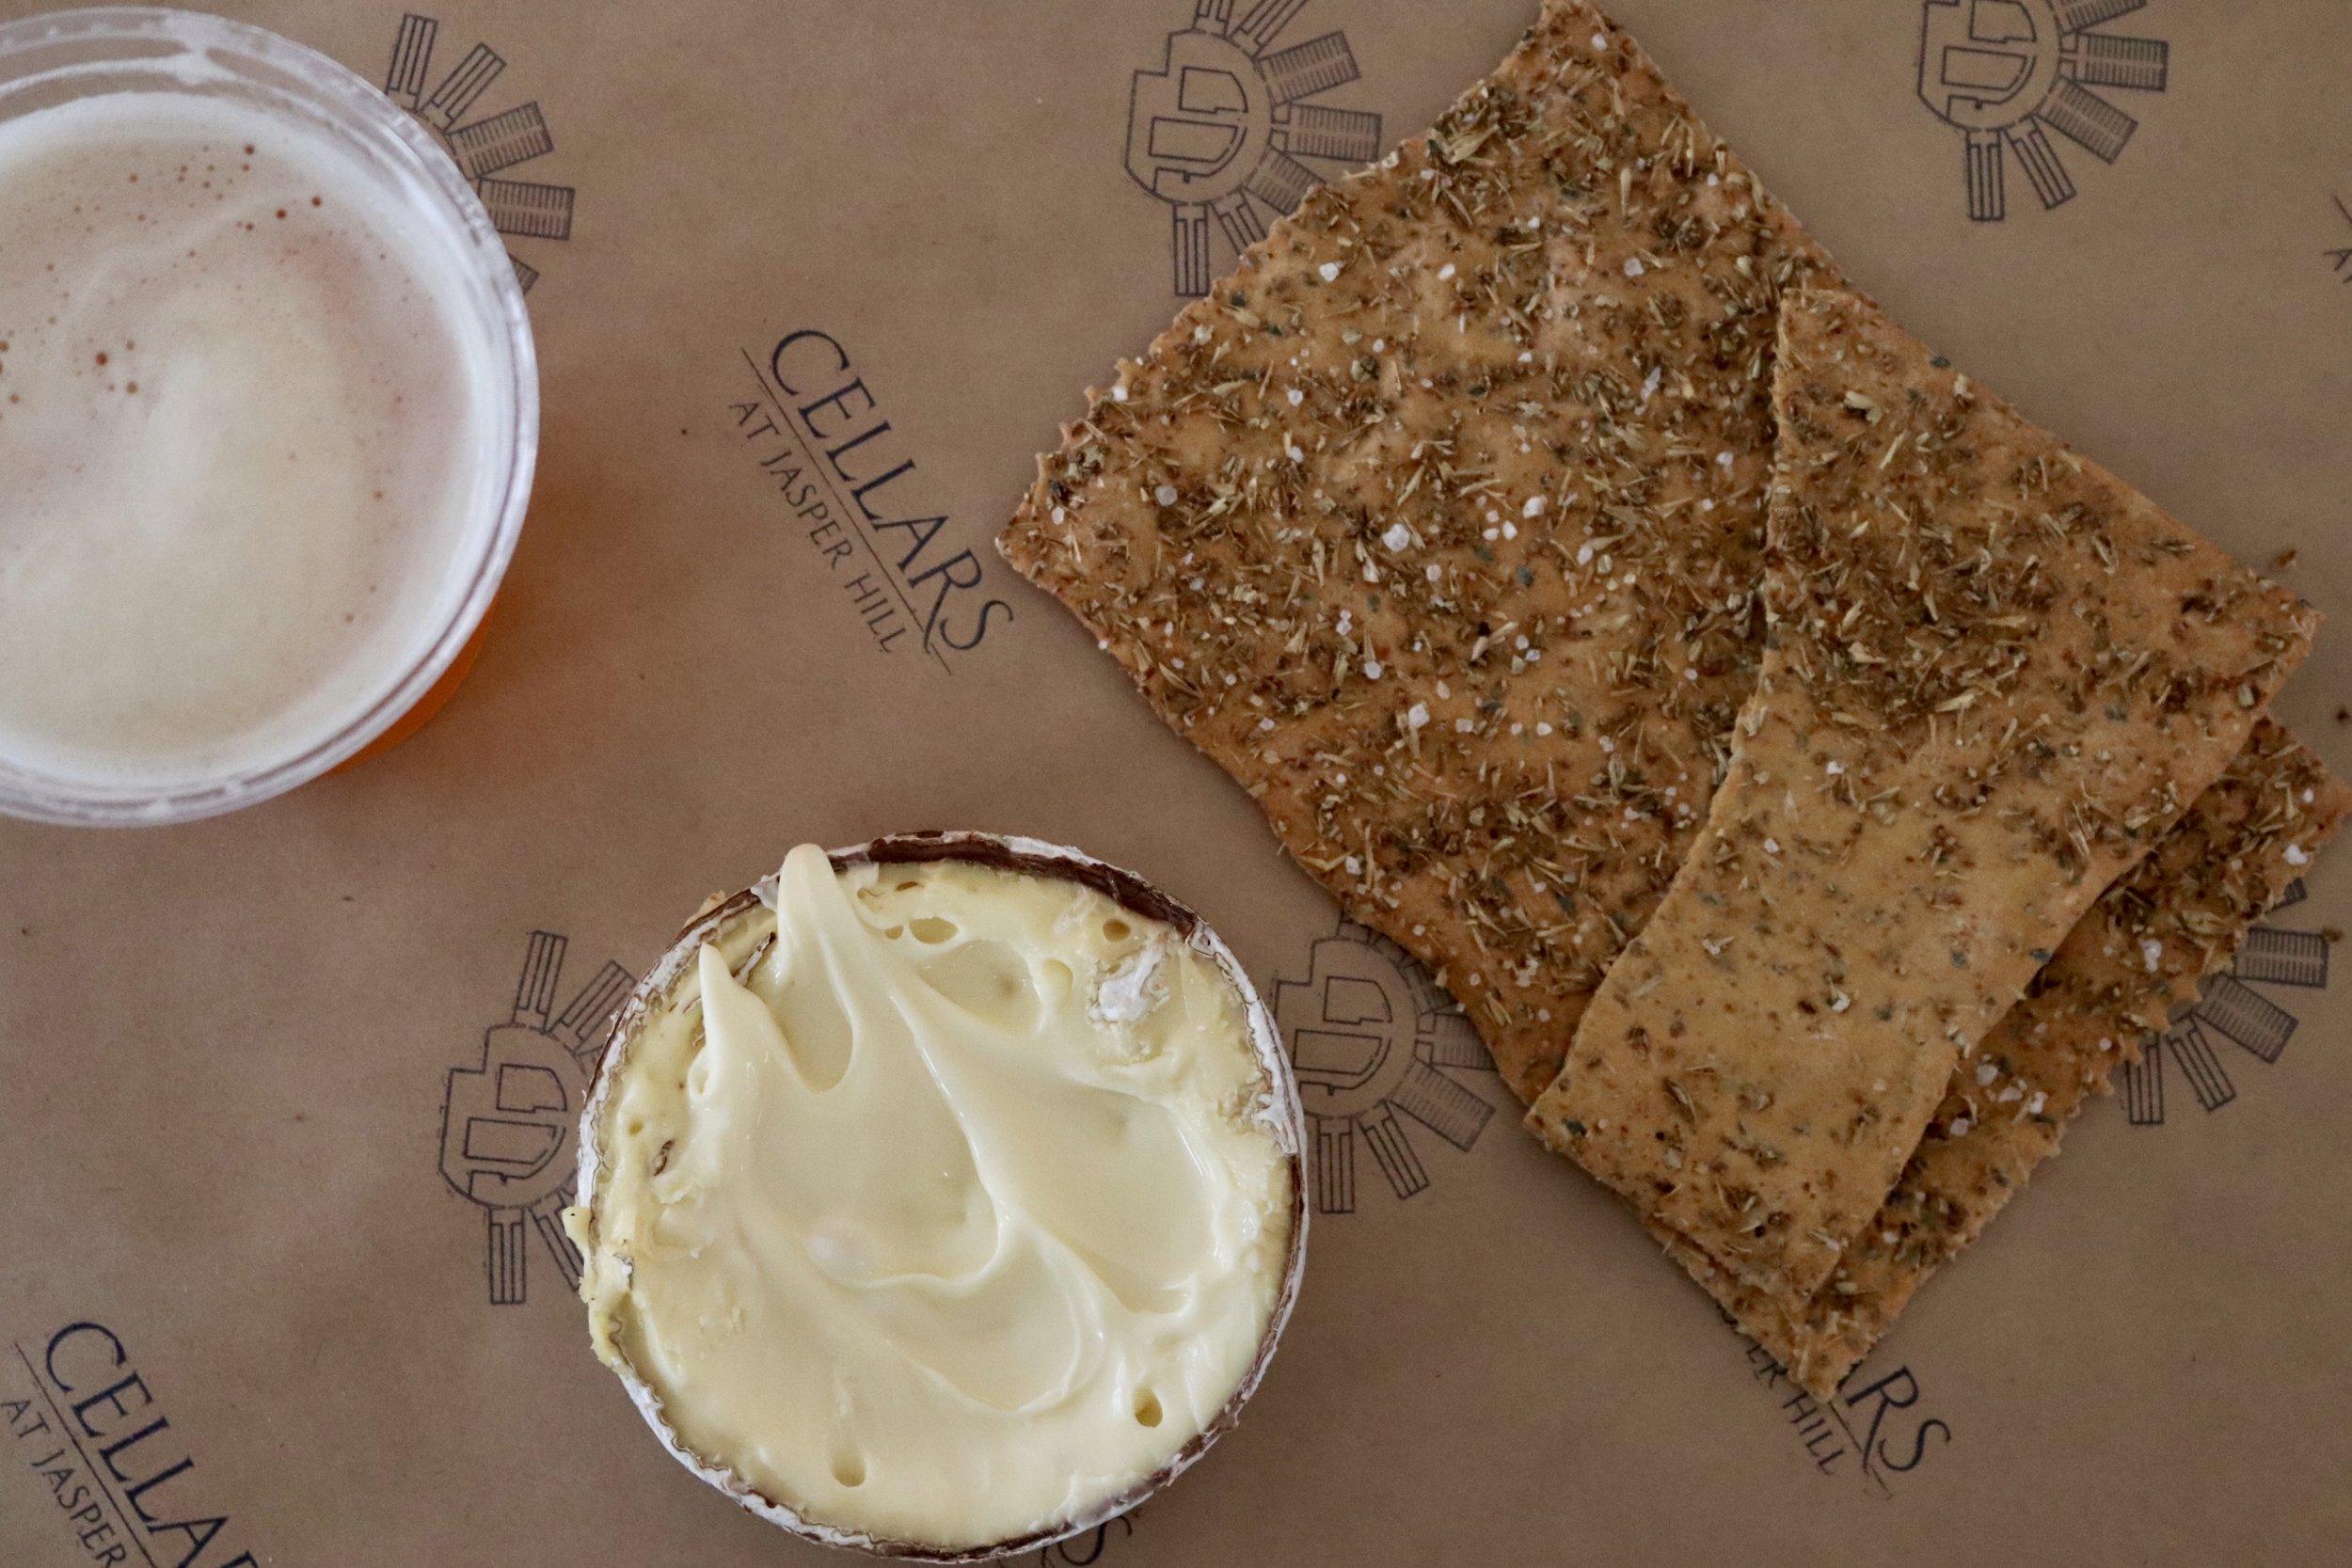 harbison, sip of sunshine IPA and Vermont beer crackers